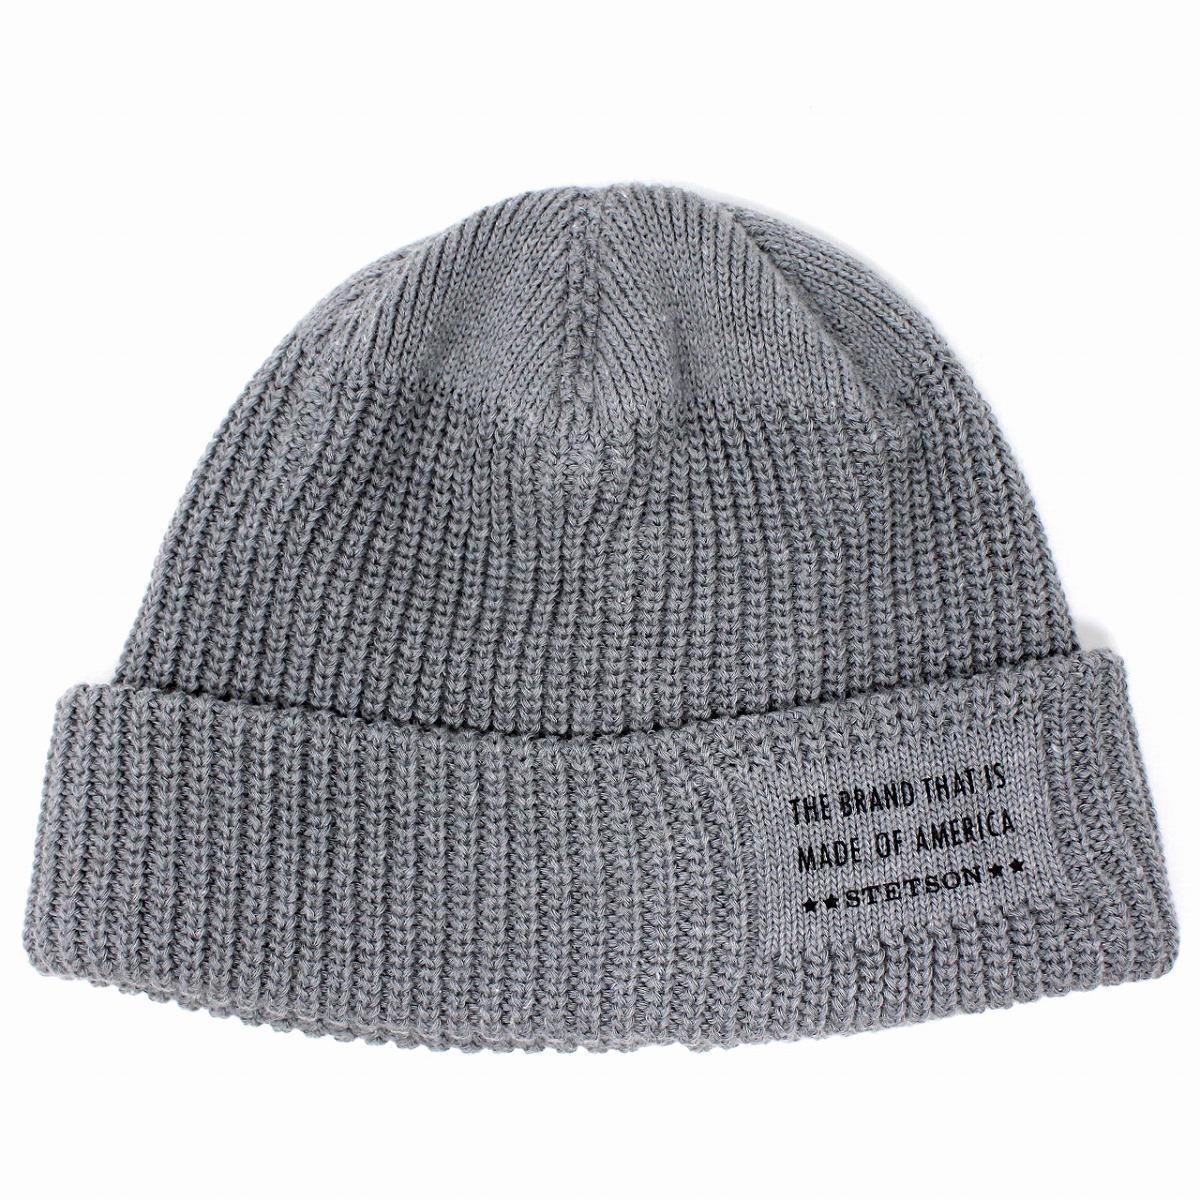 66b19e11f2c ELEHELM HAT STORE  Lady s adjustable size ROYAL STETSON hat   light ...